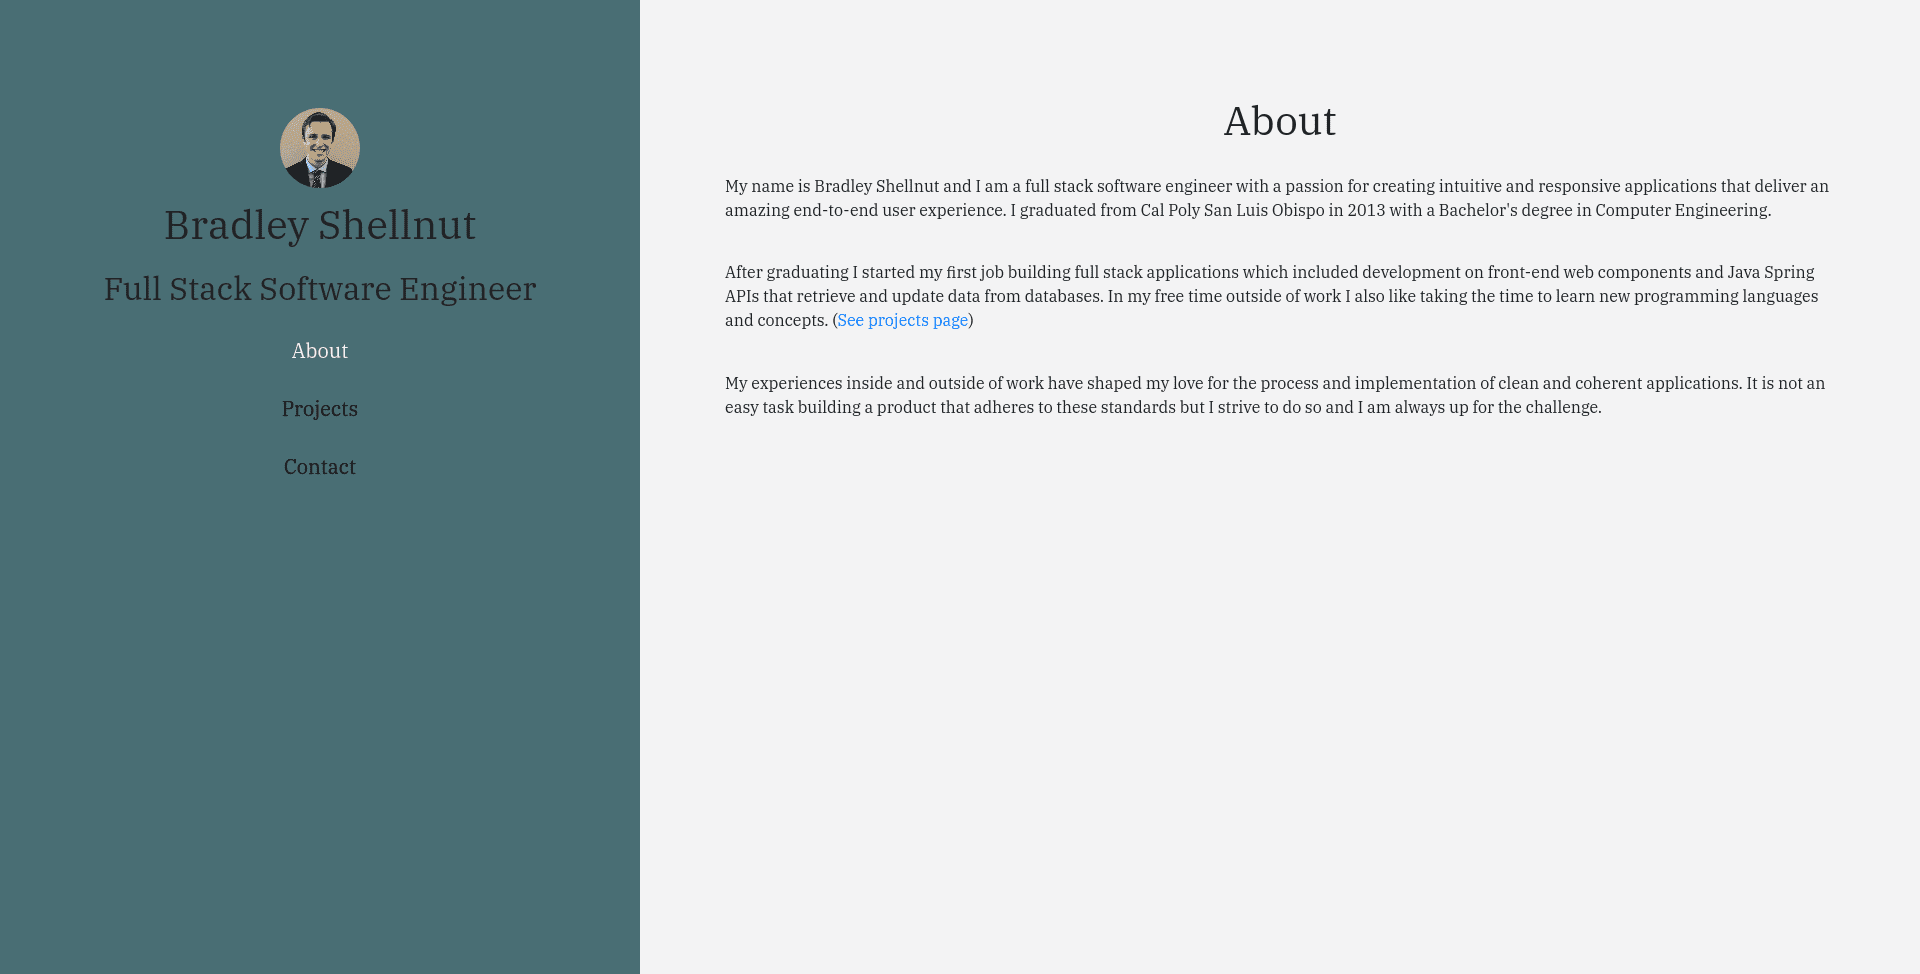 Home Page of old bradleyshellnut.com